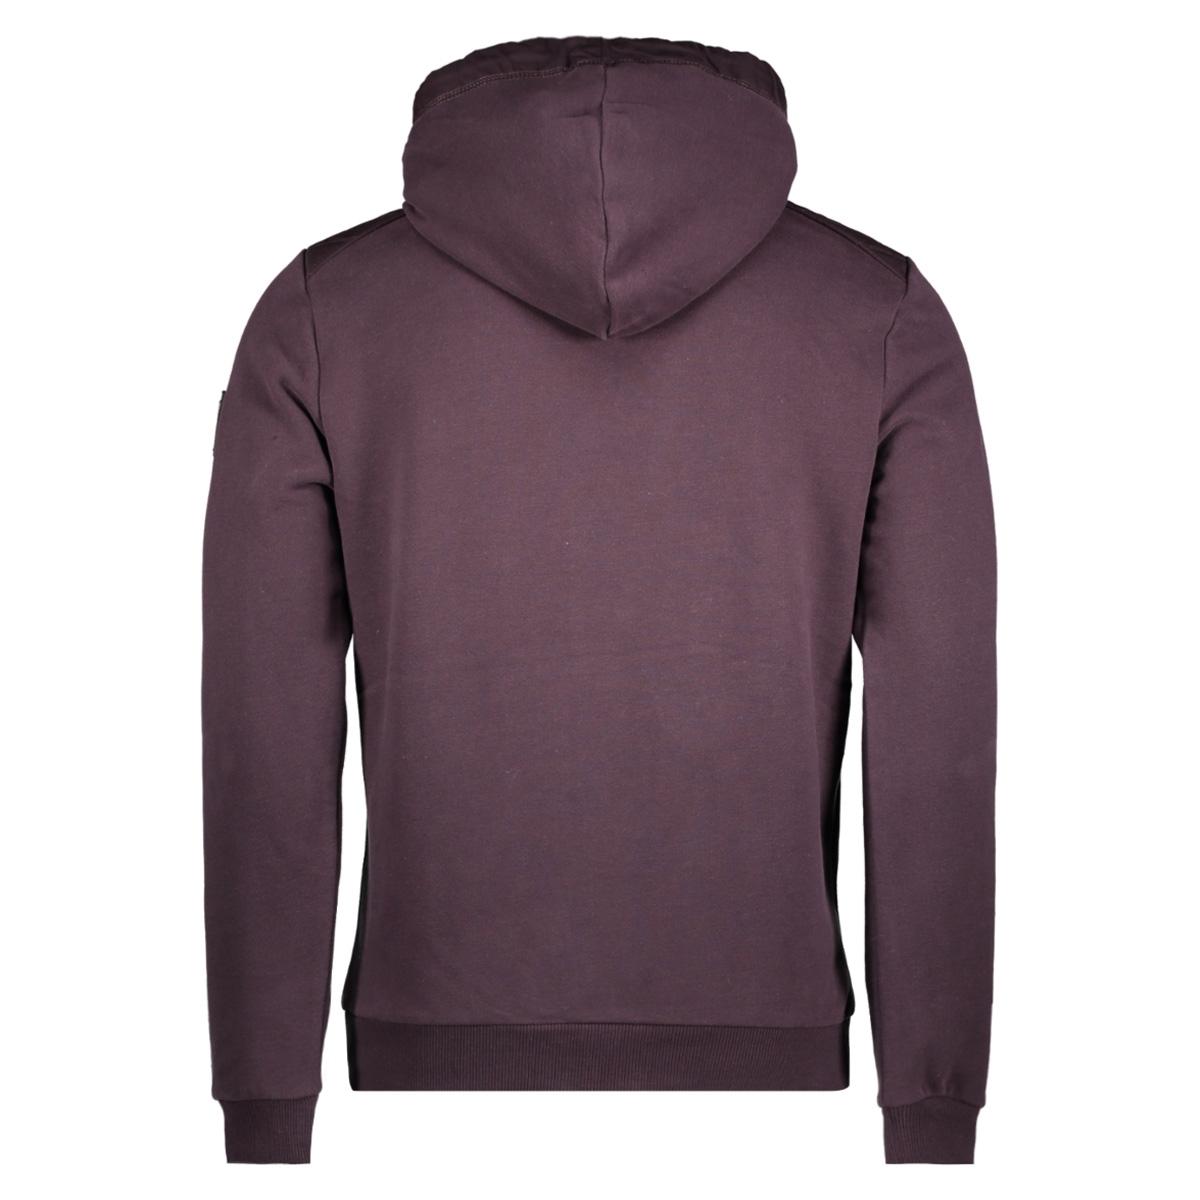 82100914 no-excess vest 183 aubergine